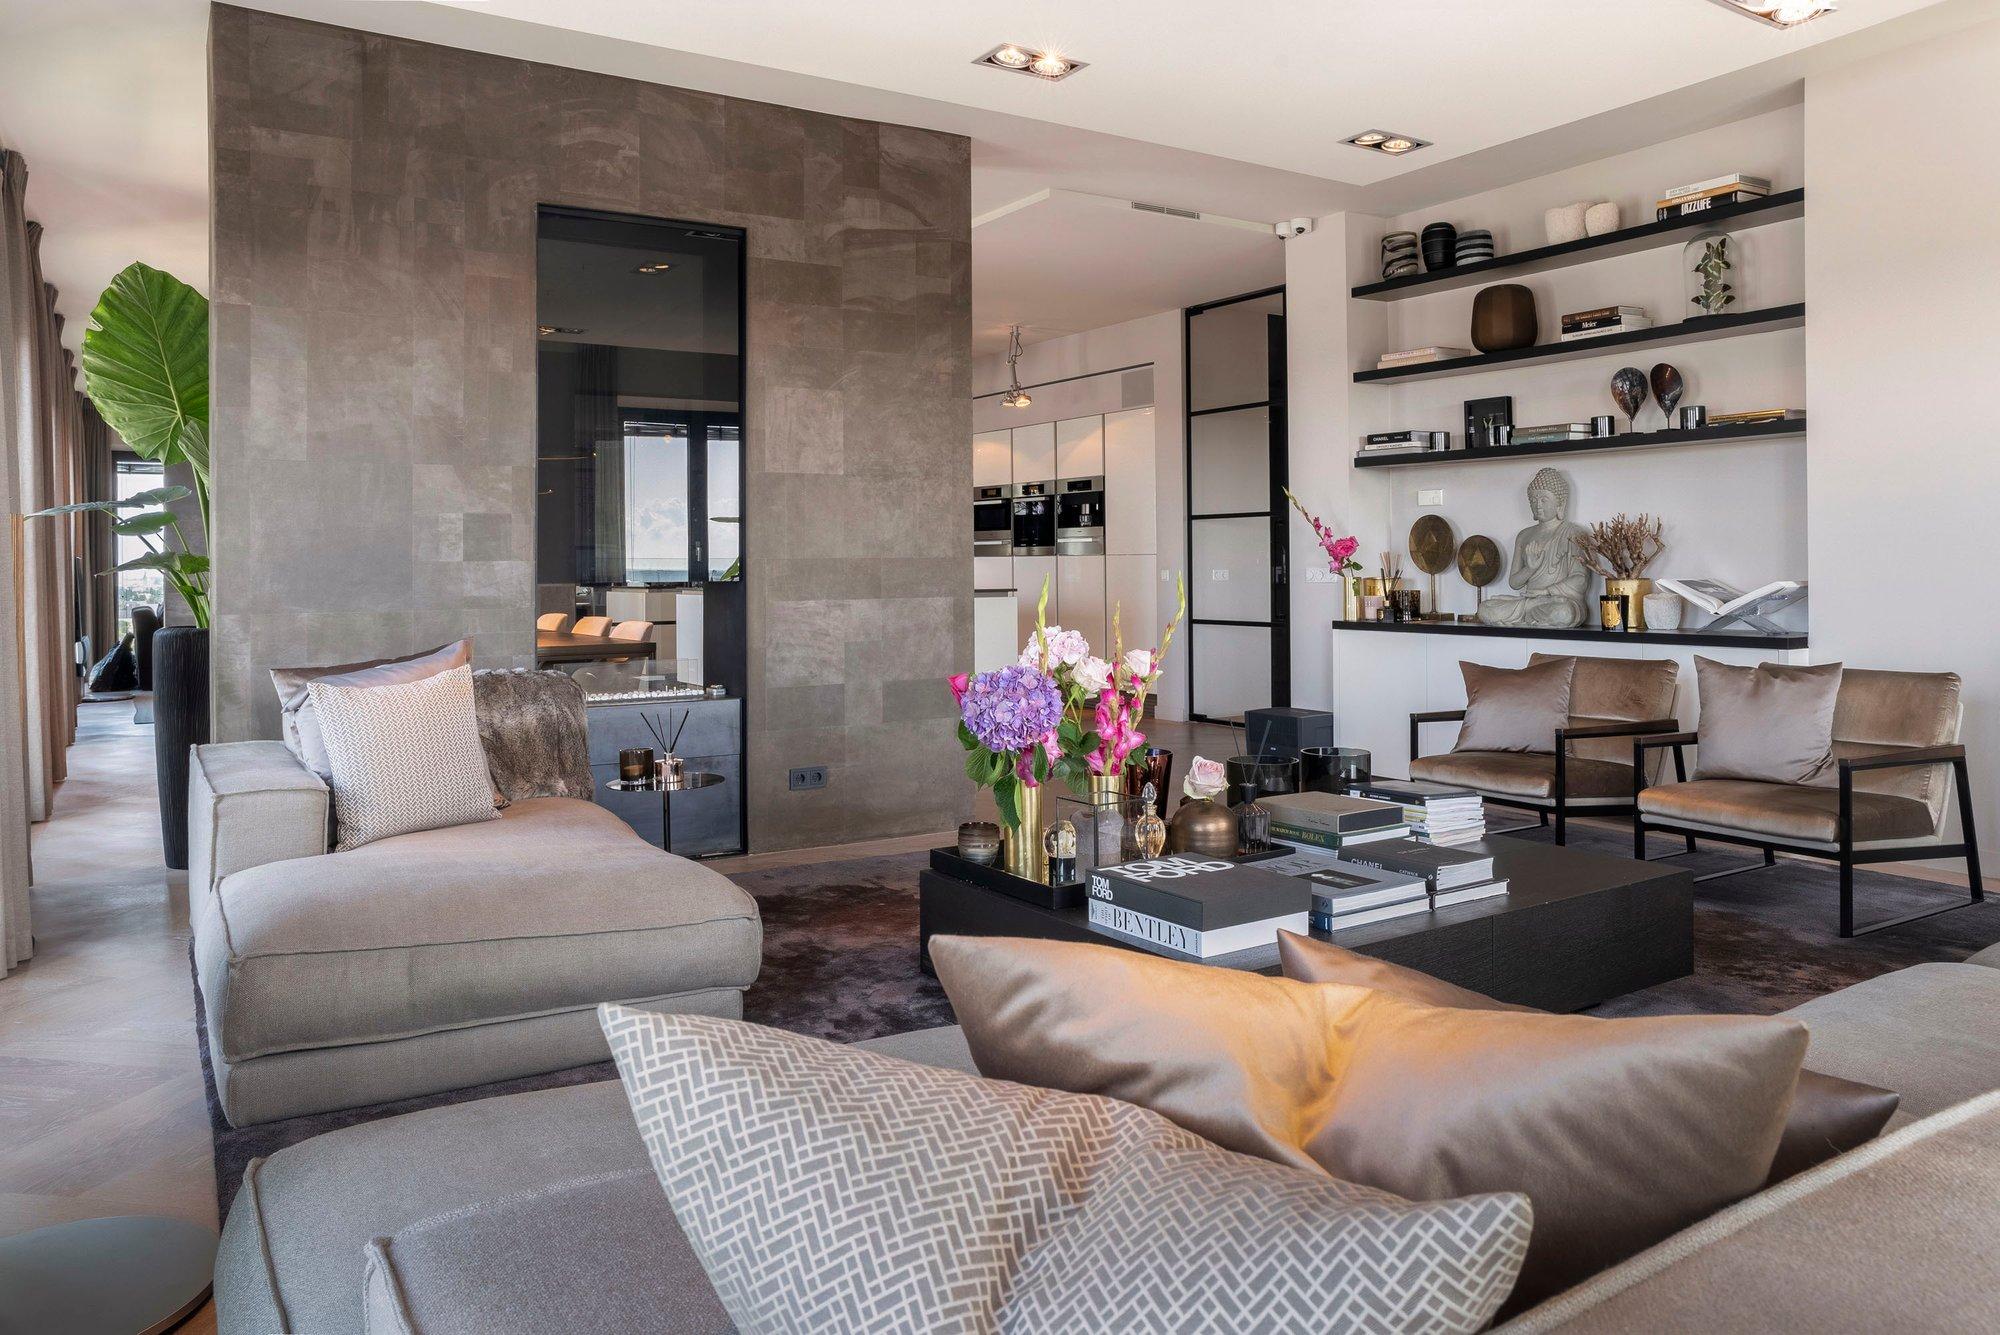 Apartment in Apollobuurt, North Holland, Netherlands 1 - 11612419